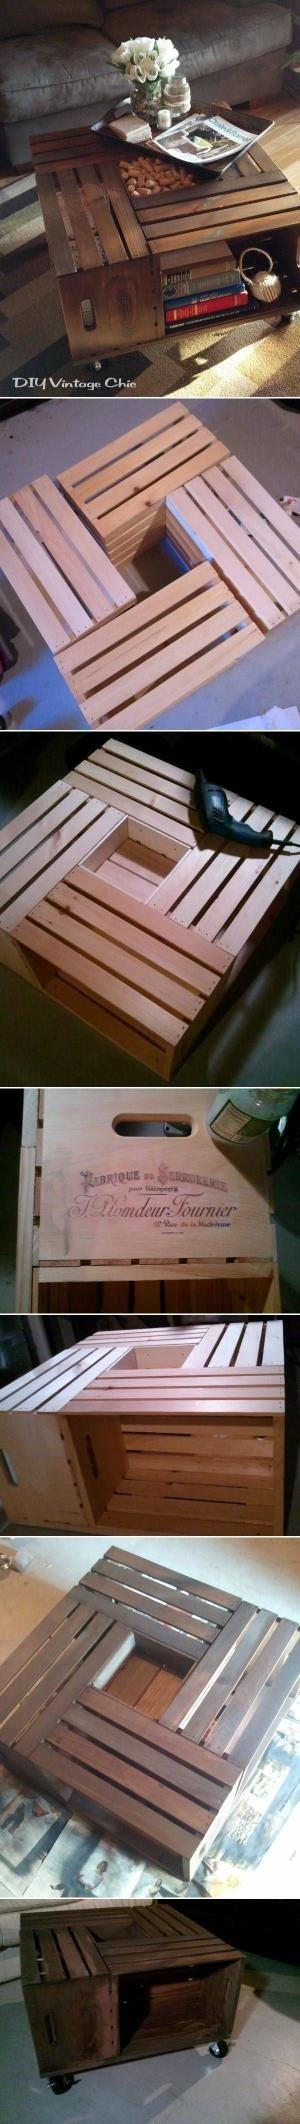 DIY Bookshelf by Danielle31